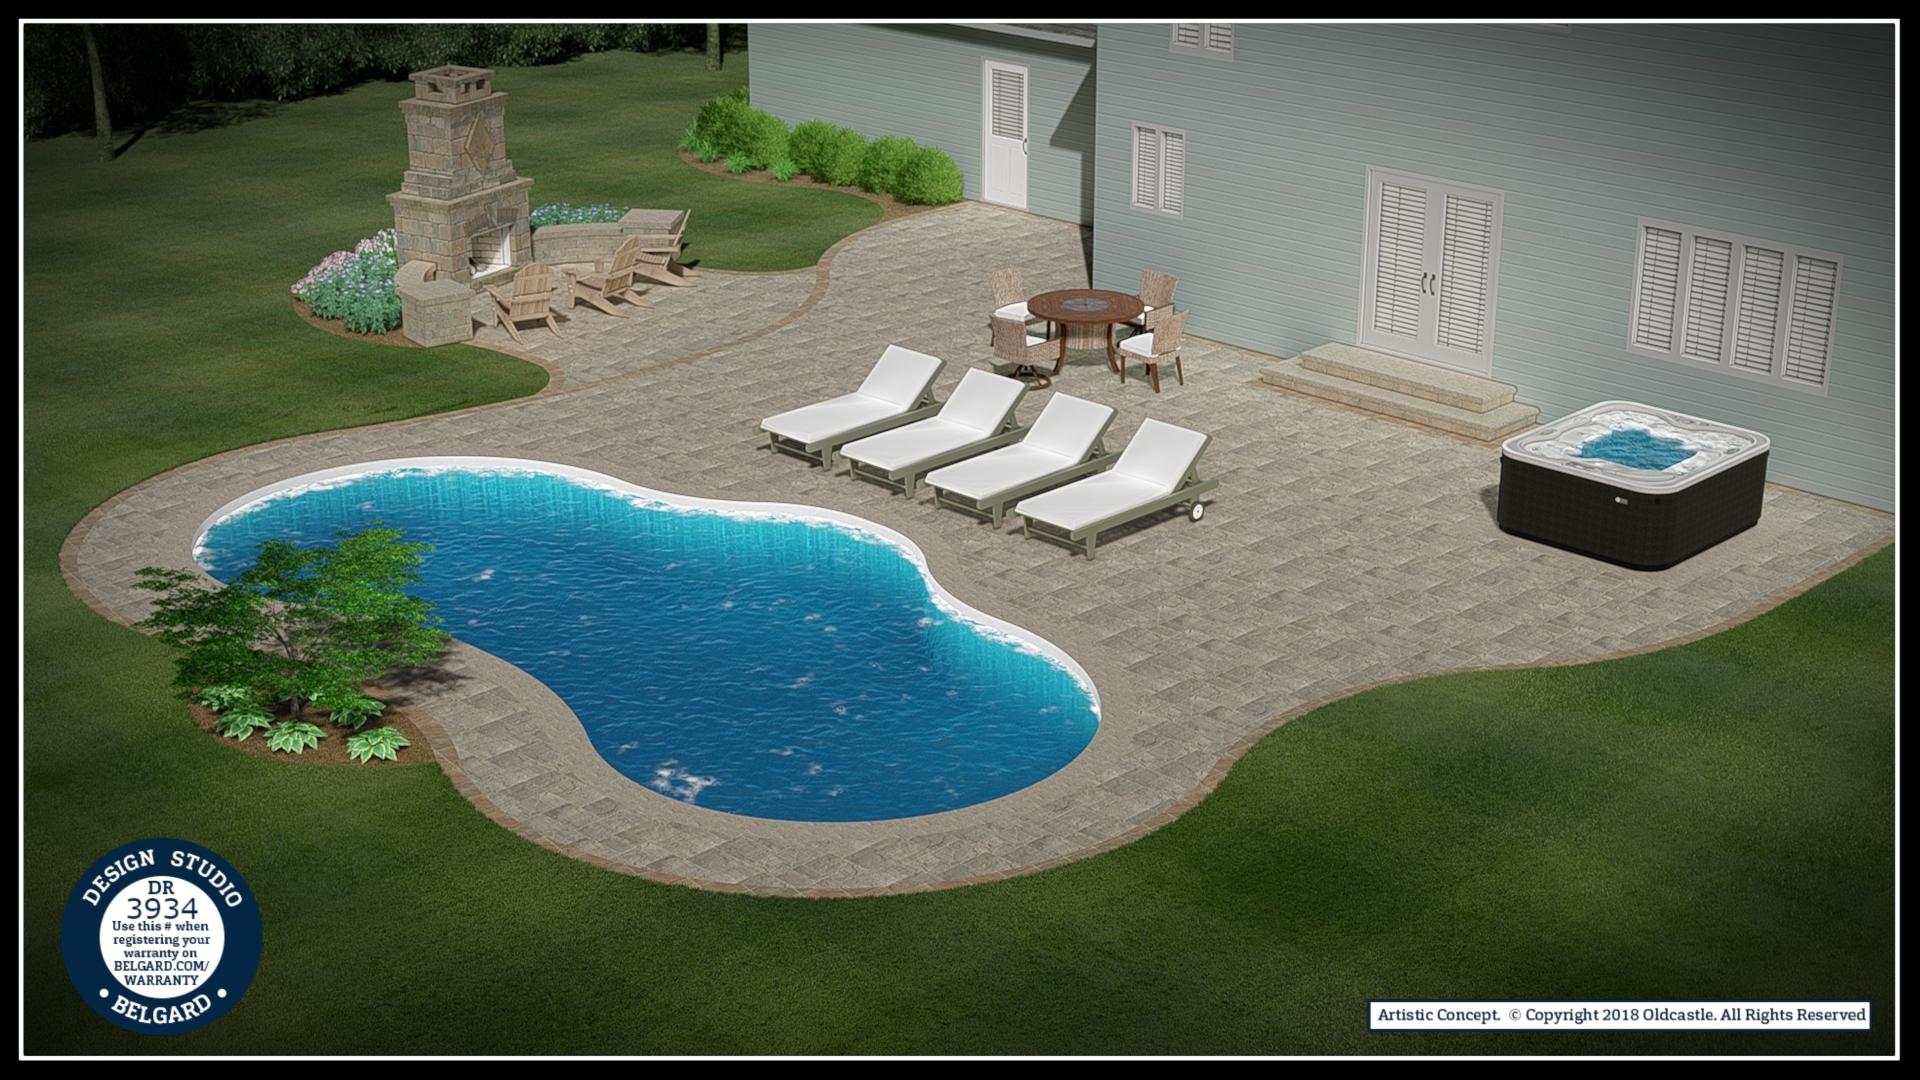 Vosters Landscaping | Pool Deck | Firepit | Brick | Hardscape | Outdoor Living | Patio | Belgard | Design Studio